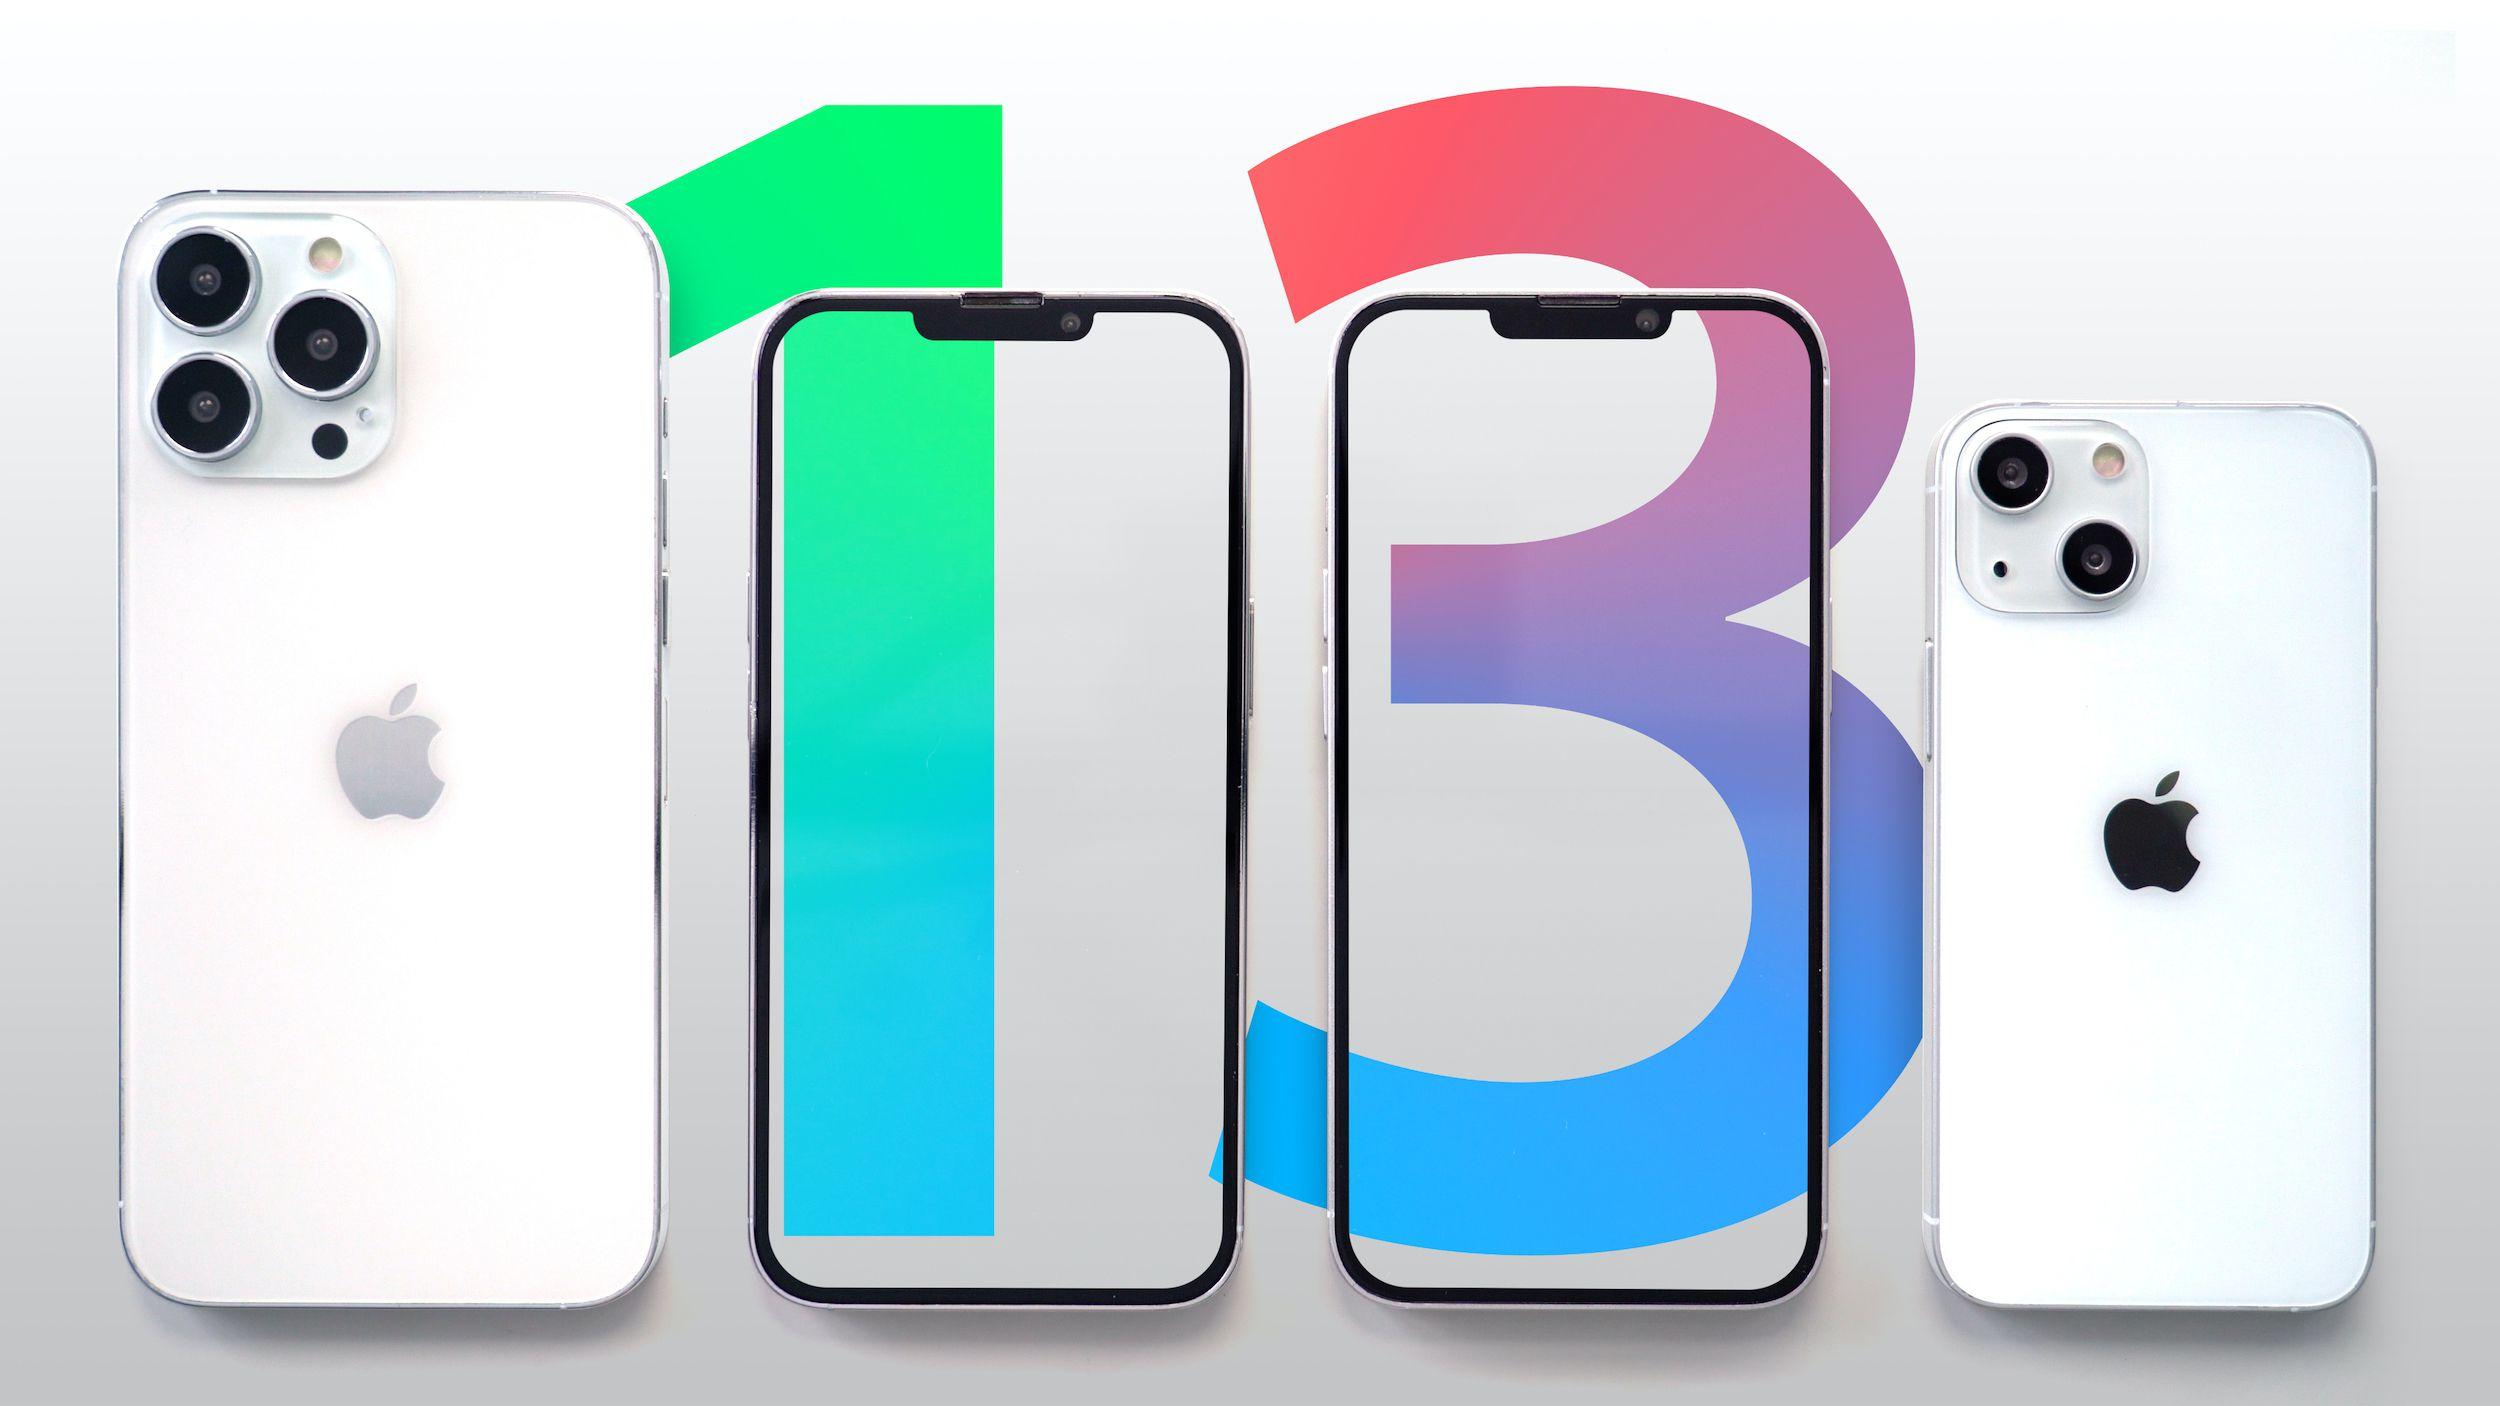 Rygte - iPhone 13-serien præsenteres den 14. september